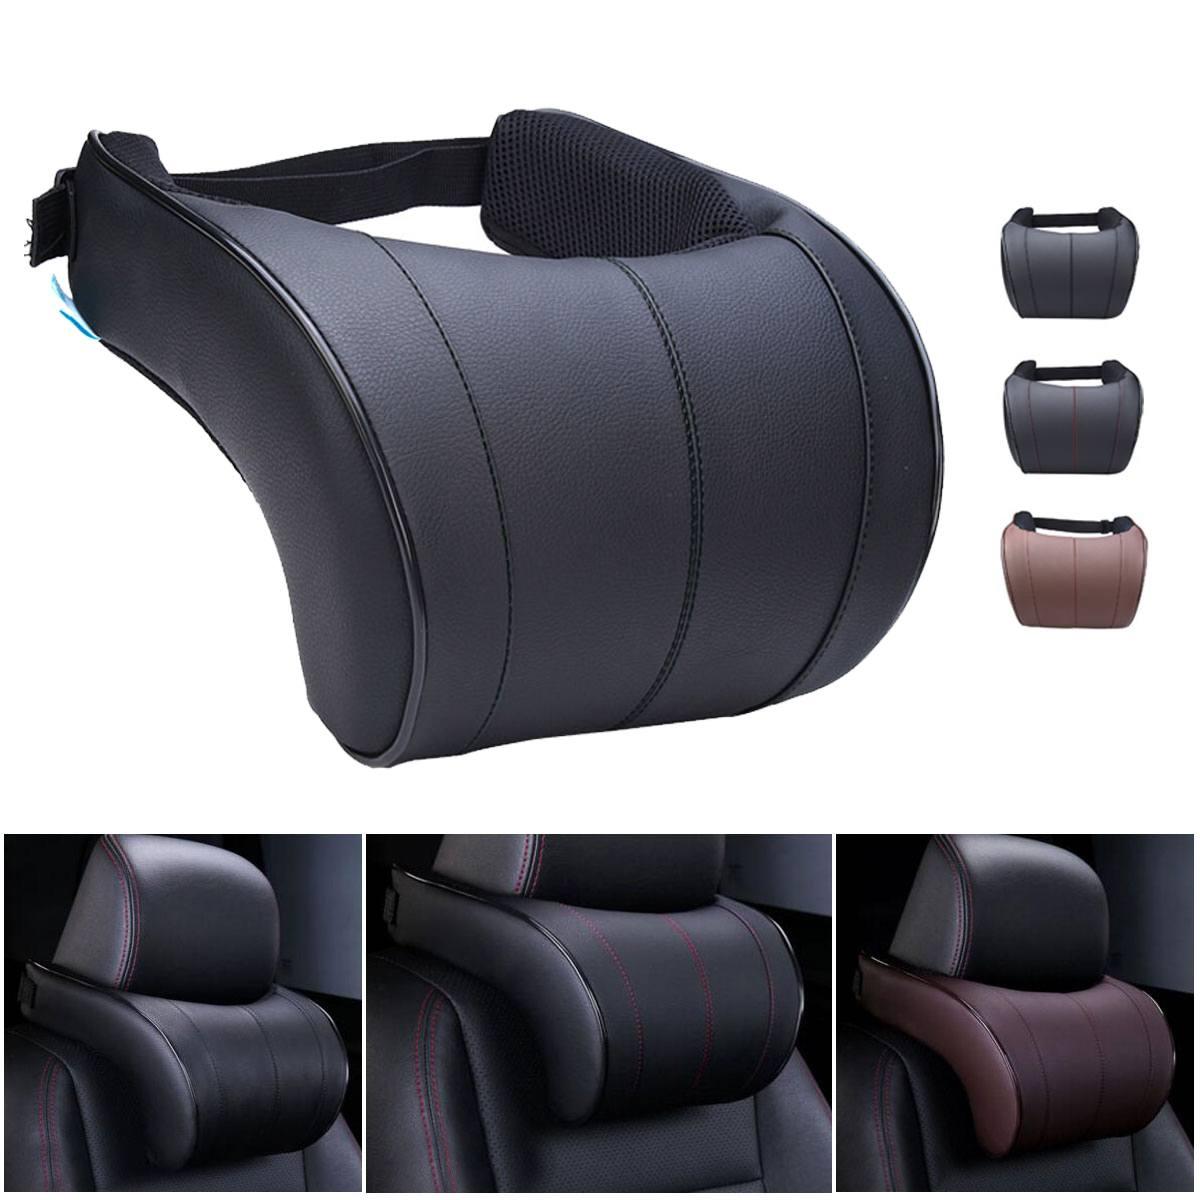 PU Leather Auto Car Neck Pillow Memory Foam Filling Neck Rest Seat Headrest Pillow For Car Gadget Auto Accessories